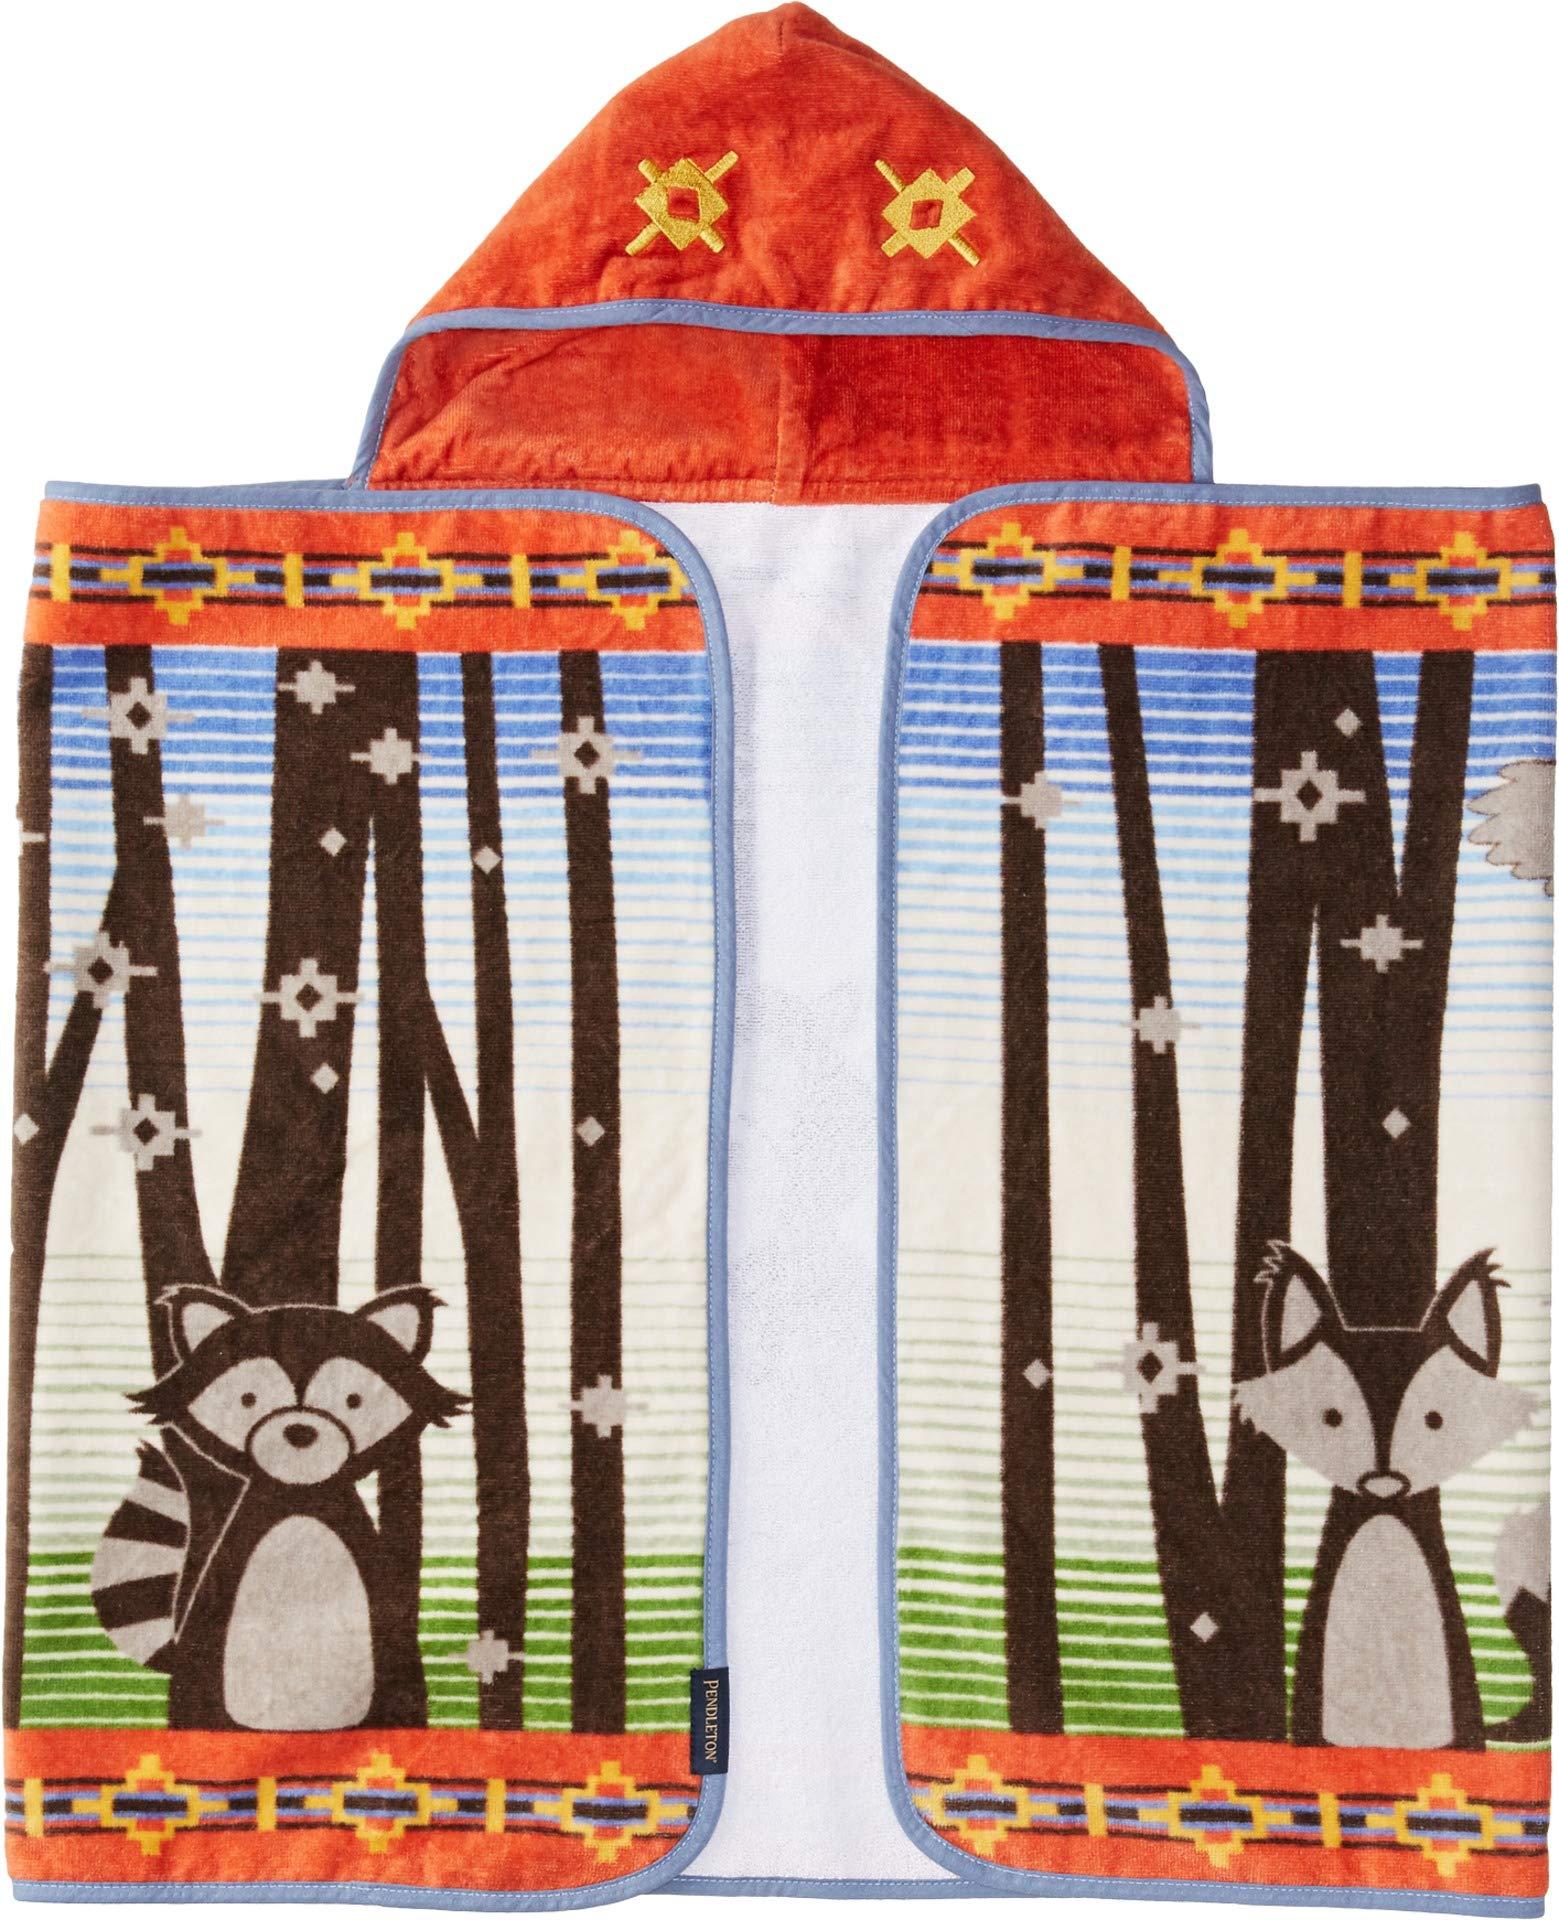 Pendleton Printed Hooded Baby Towel Multi/Woodland Neighbors One Size by Pendleton